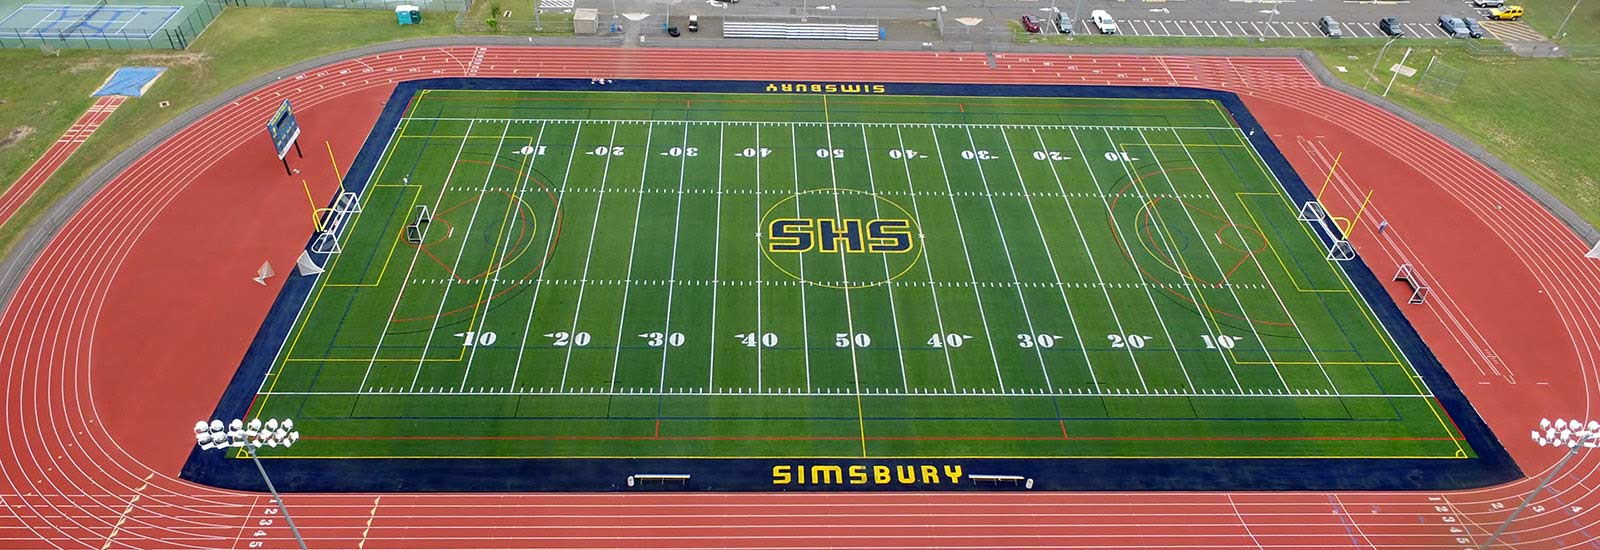 Sprinturf Field Install at Simsbury High School